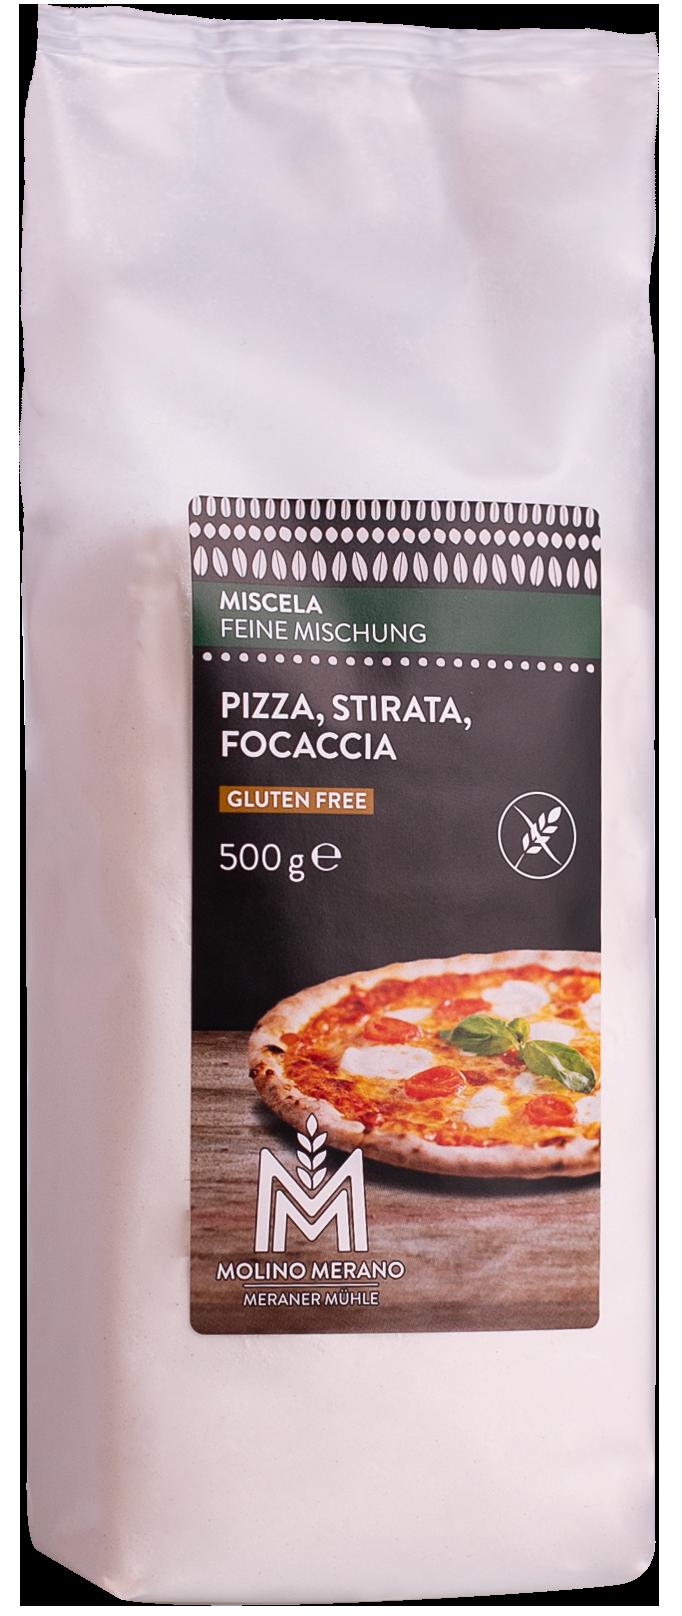 Backmischung Pizza, Stirata, Focaccia glutenfrei